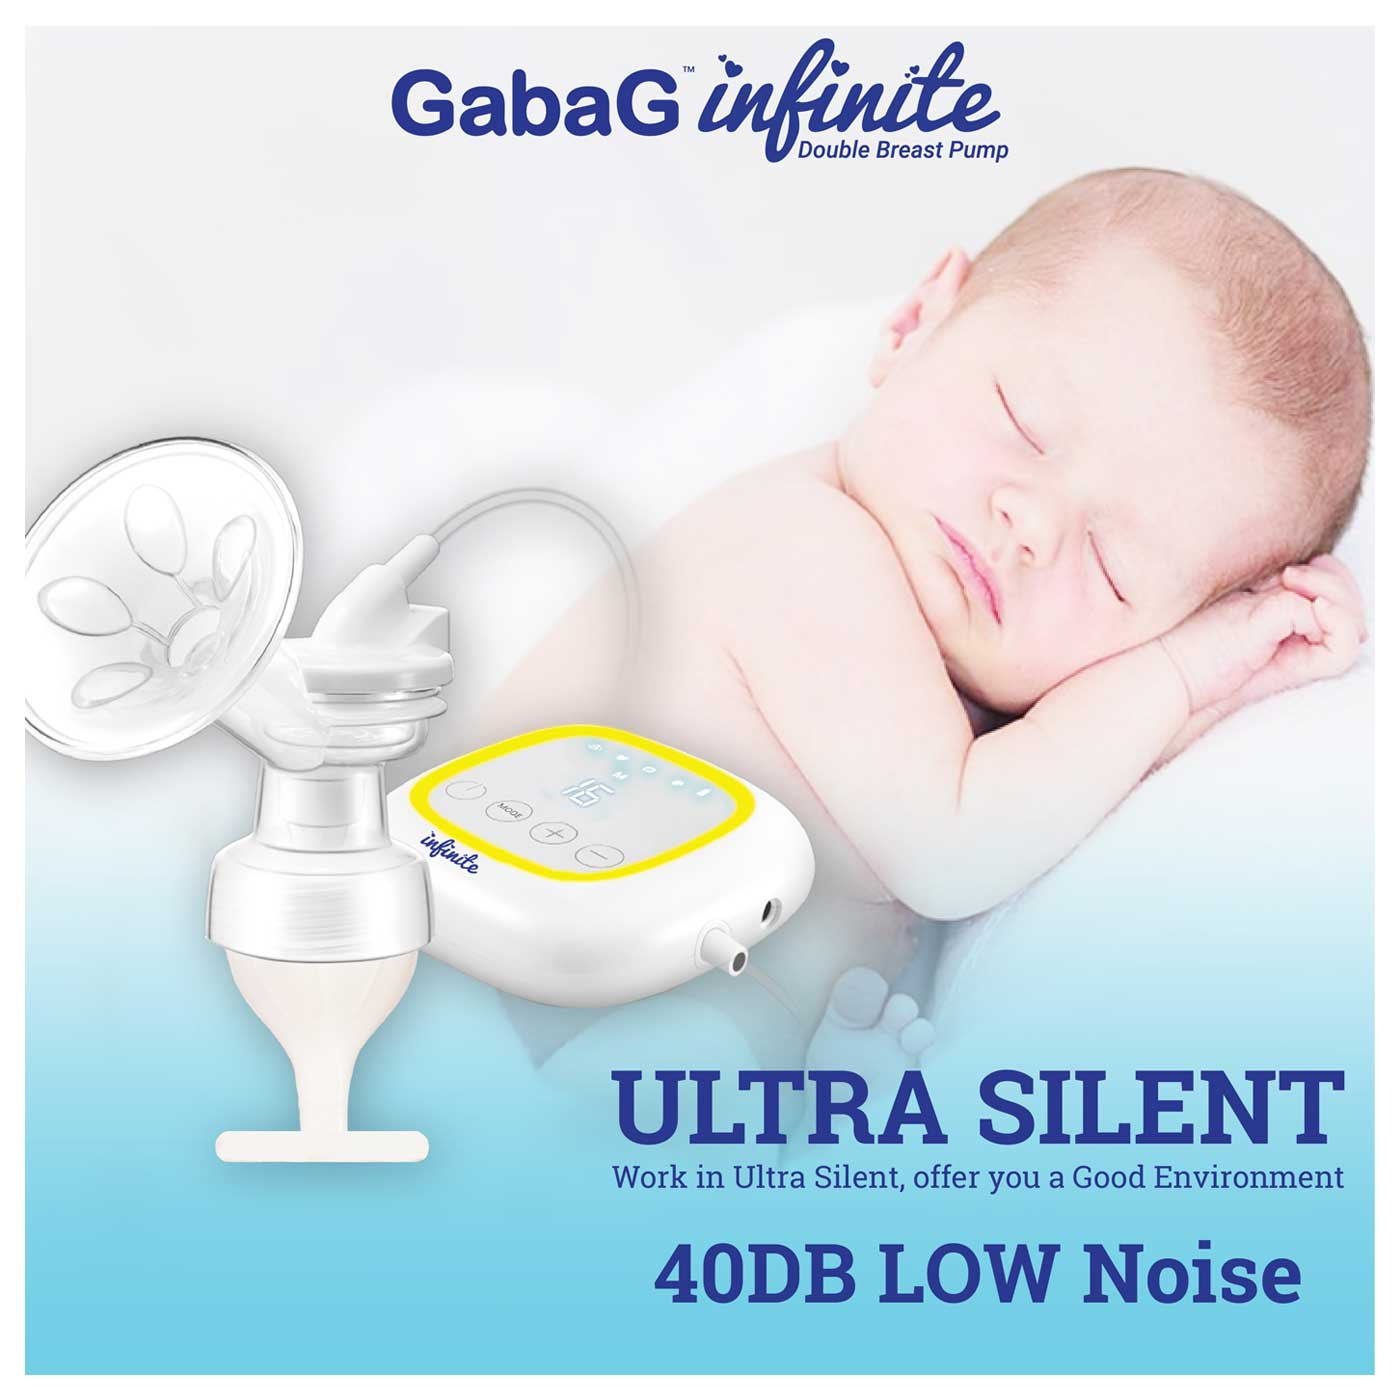 Gabag Infinite Double Breast Pump 3